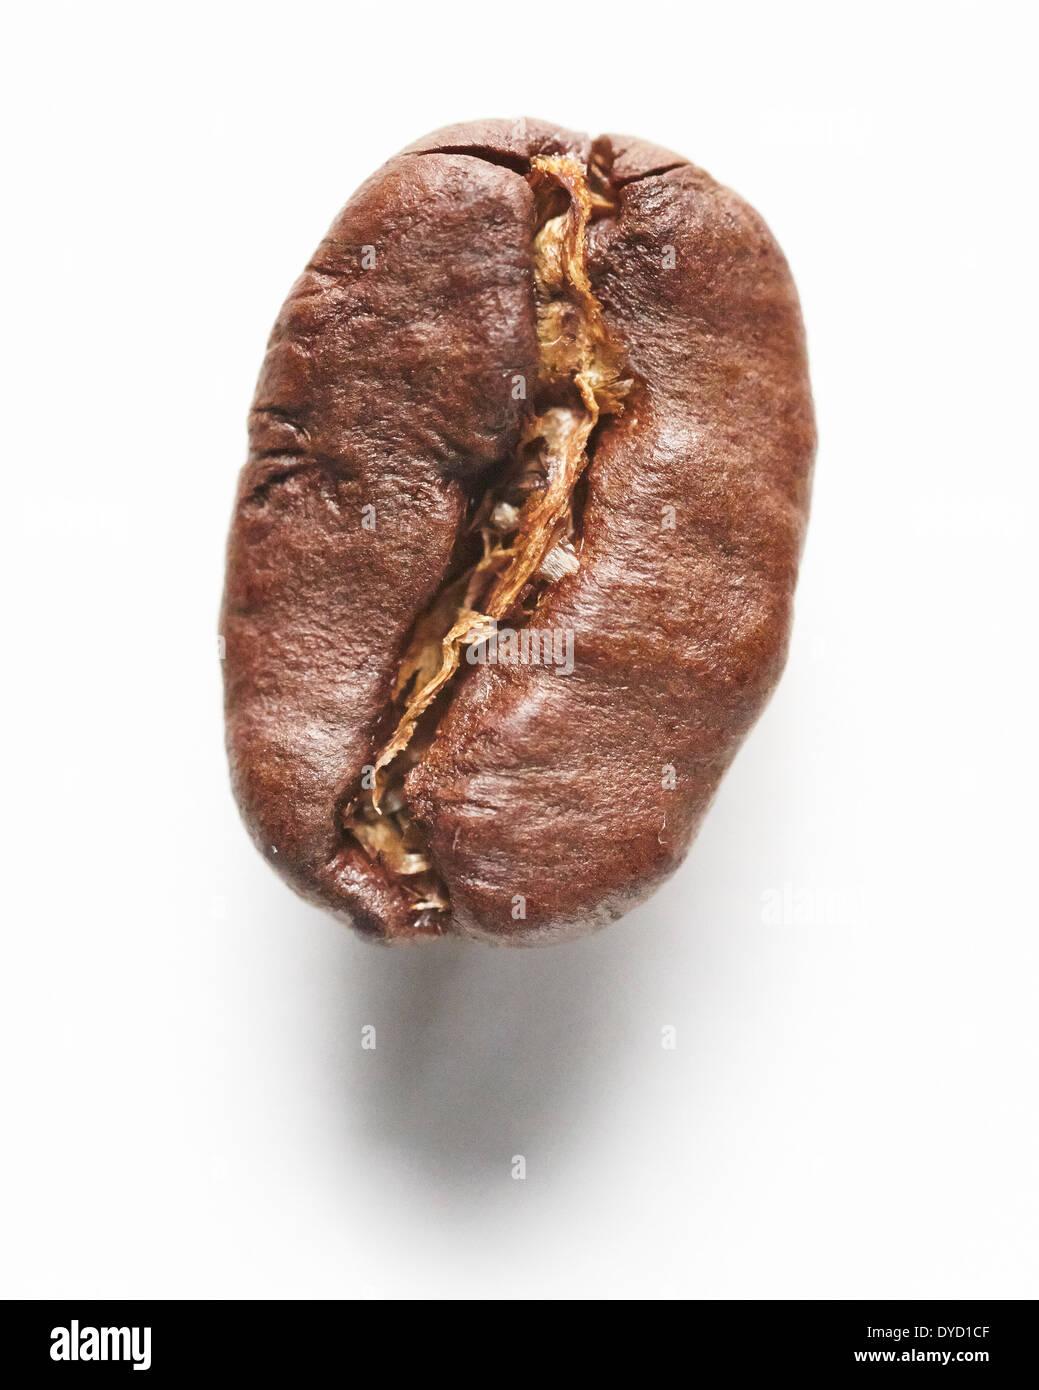 Coffee bean, closeup. - Stock Image